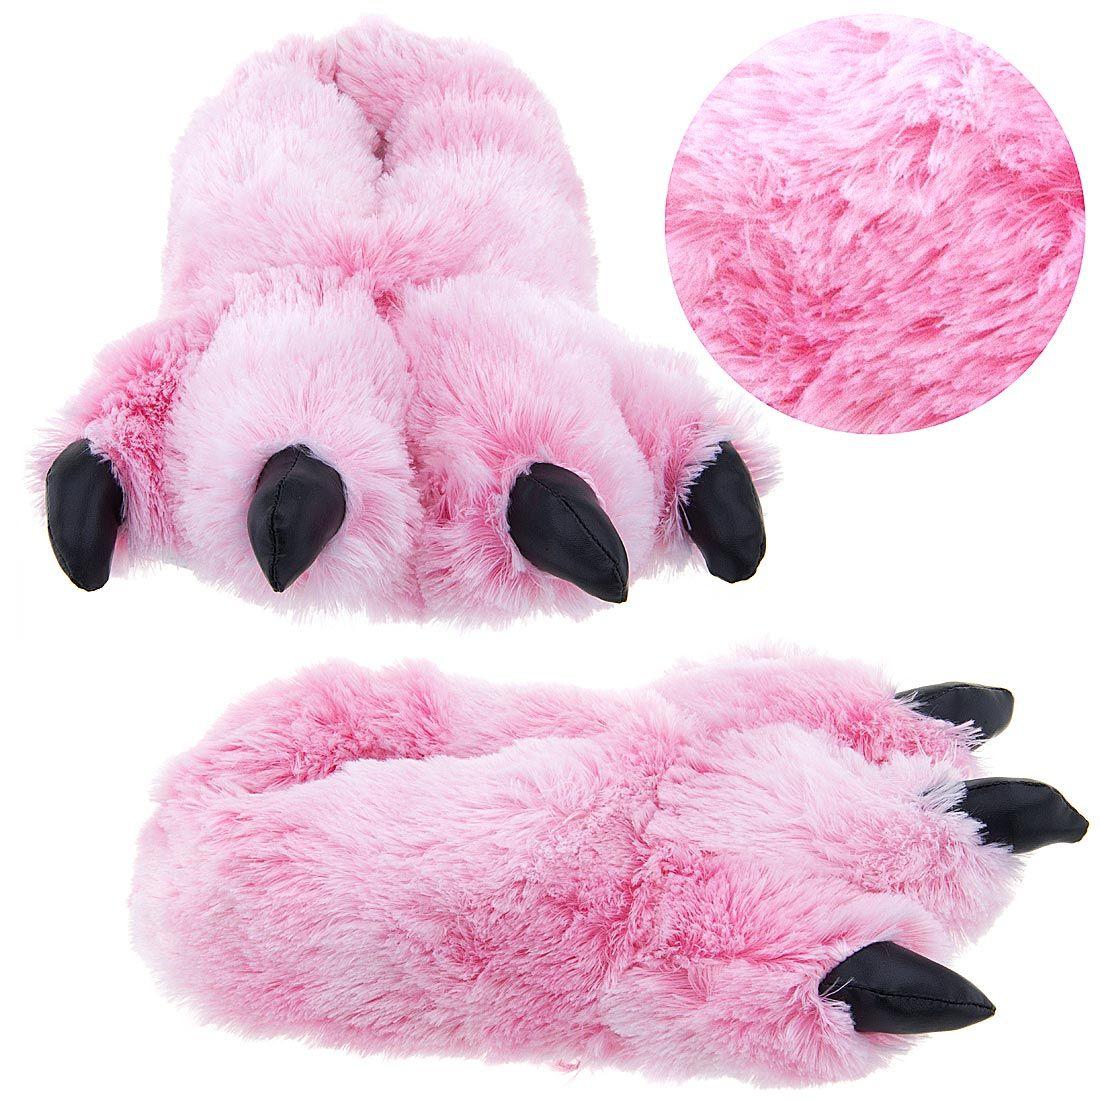 Women's Men's Unisex Warm Soft Paw Animal Slippers